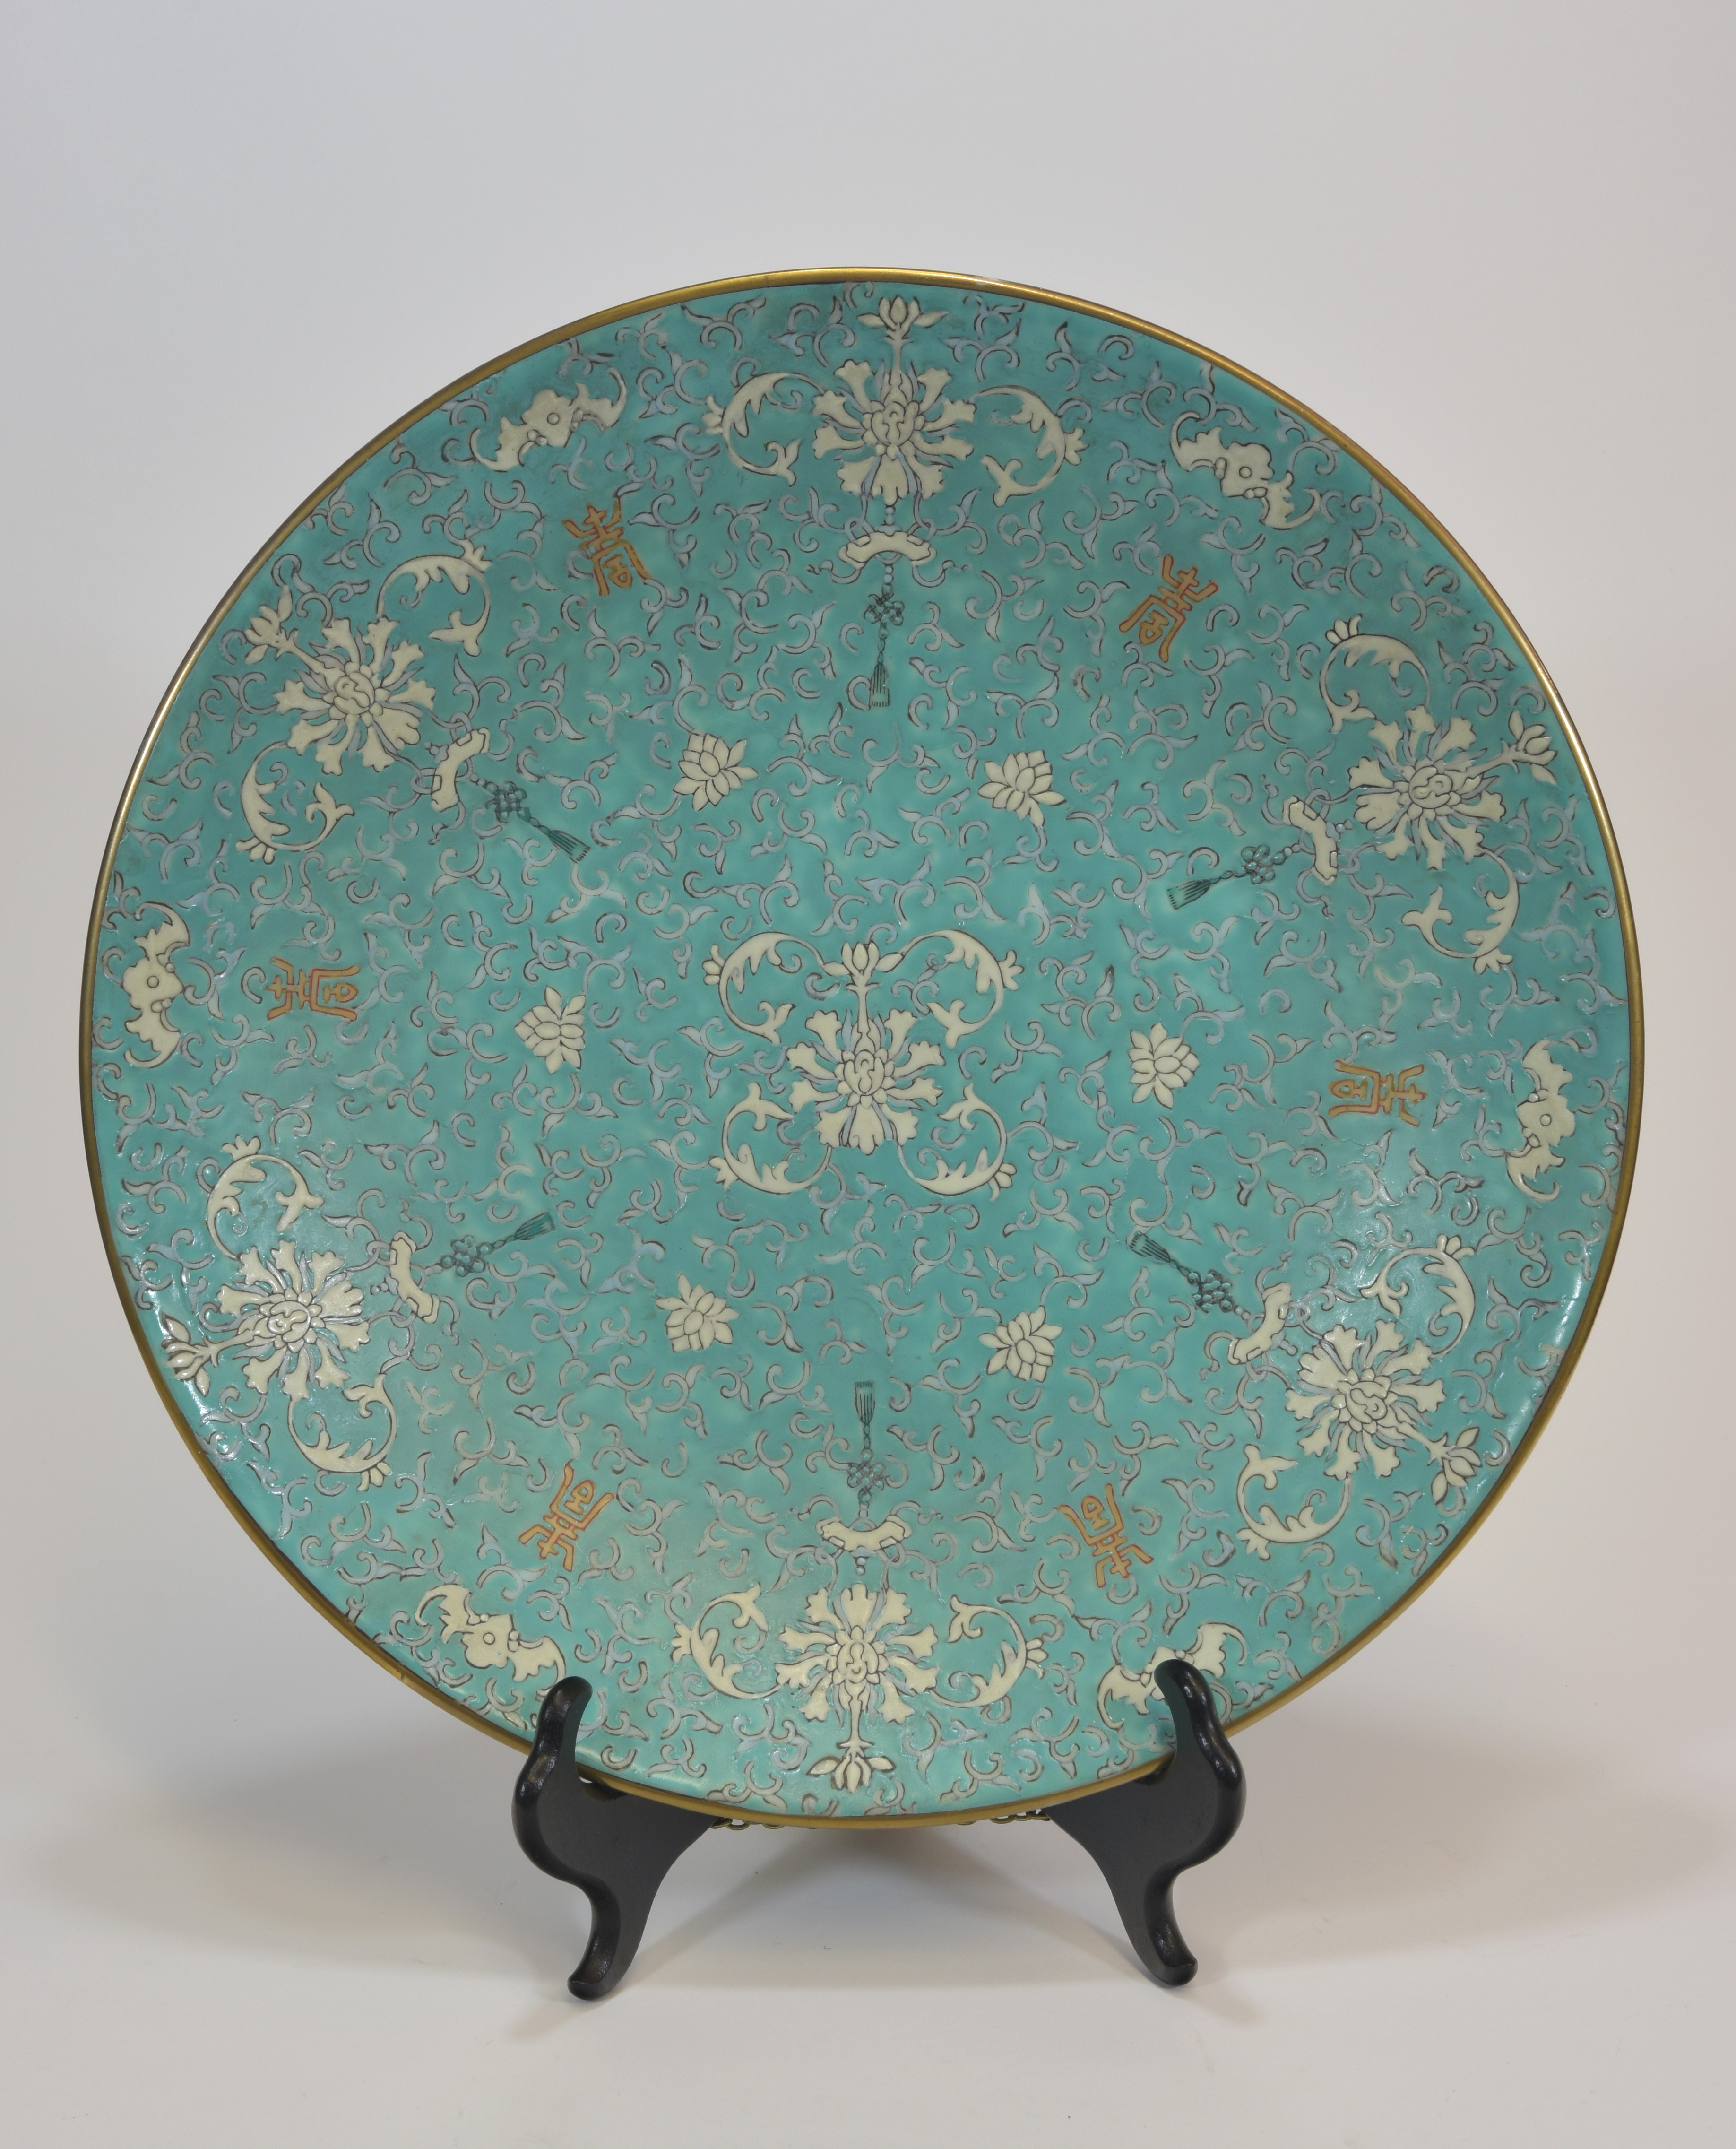 Lot 38 - A 19th century blue glazed white flower dish 33cm清 十九世紀 粉彩藍地白花碟